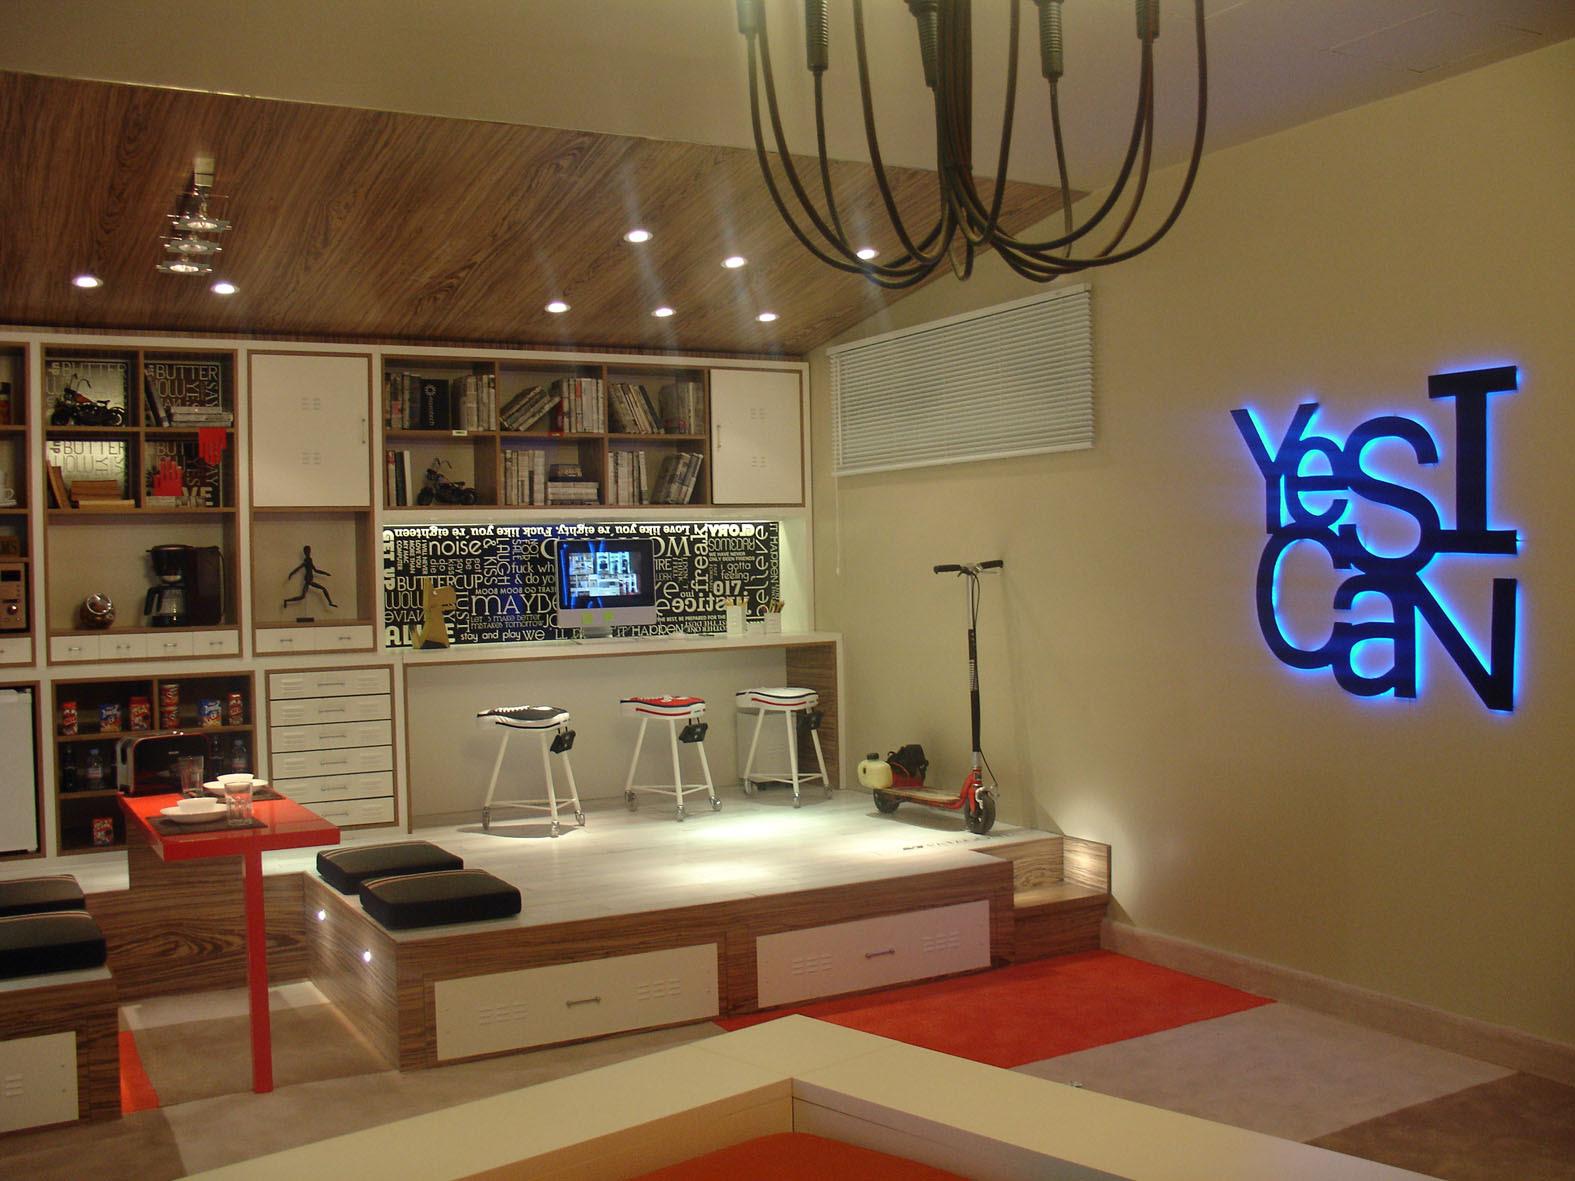 Casa-FOA-09, Arquitectura, Diseño, Decoracion, Loft-Teens,DASH DESIGN TEAM